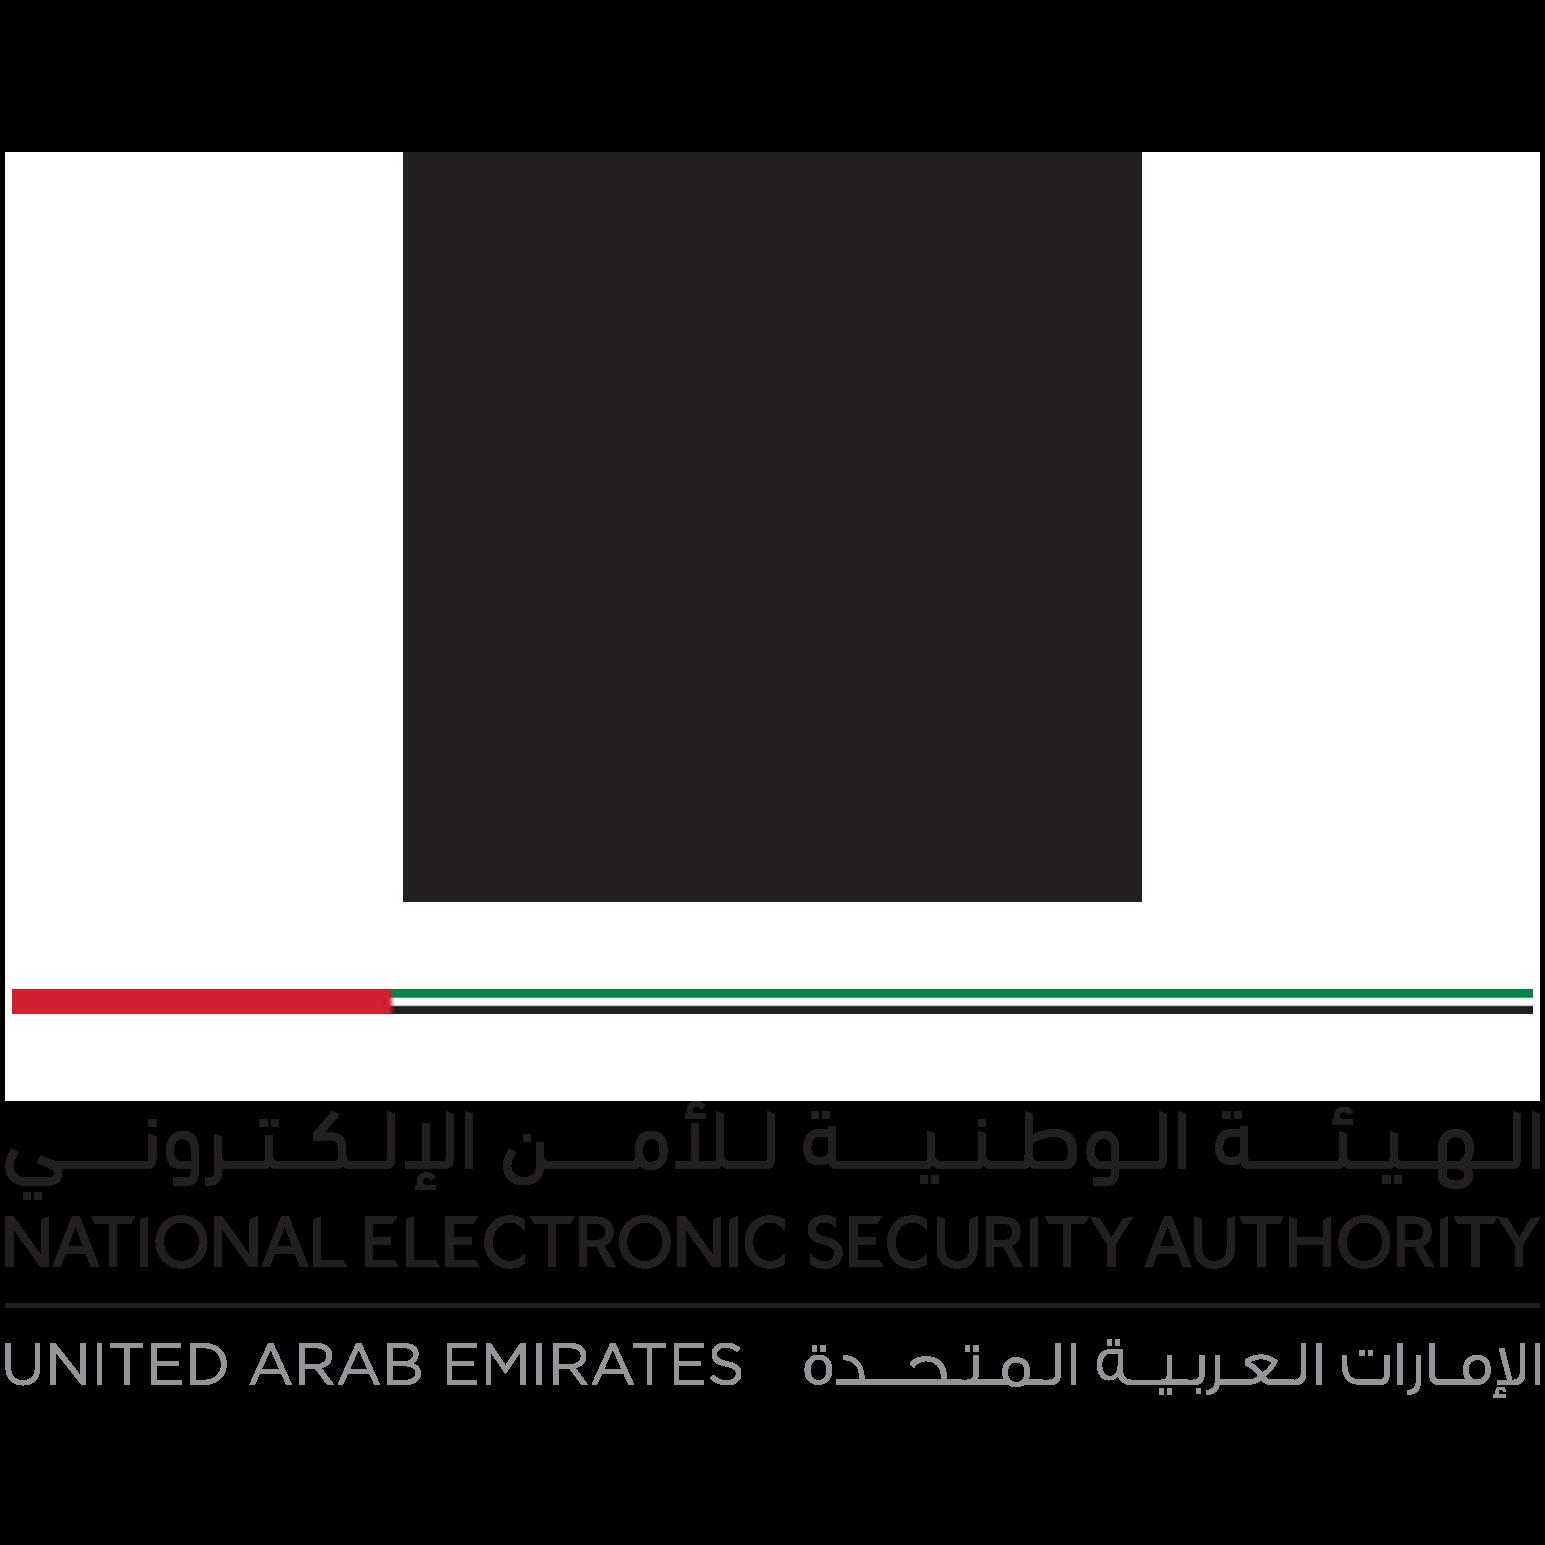 UAE Information Assurance (IA) Standards